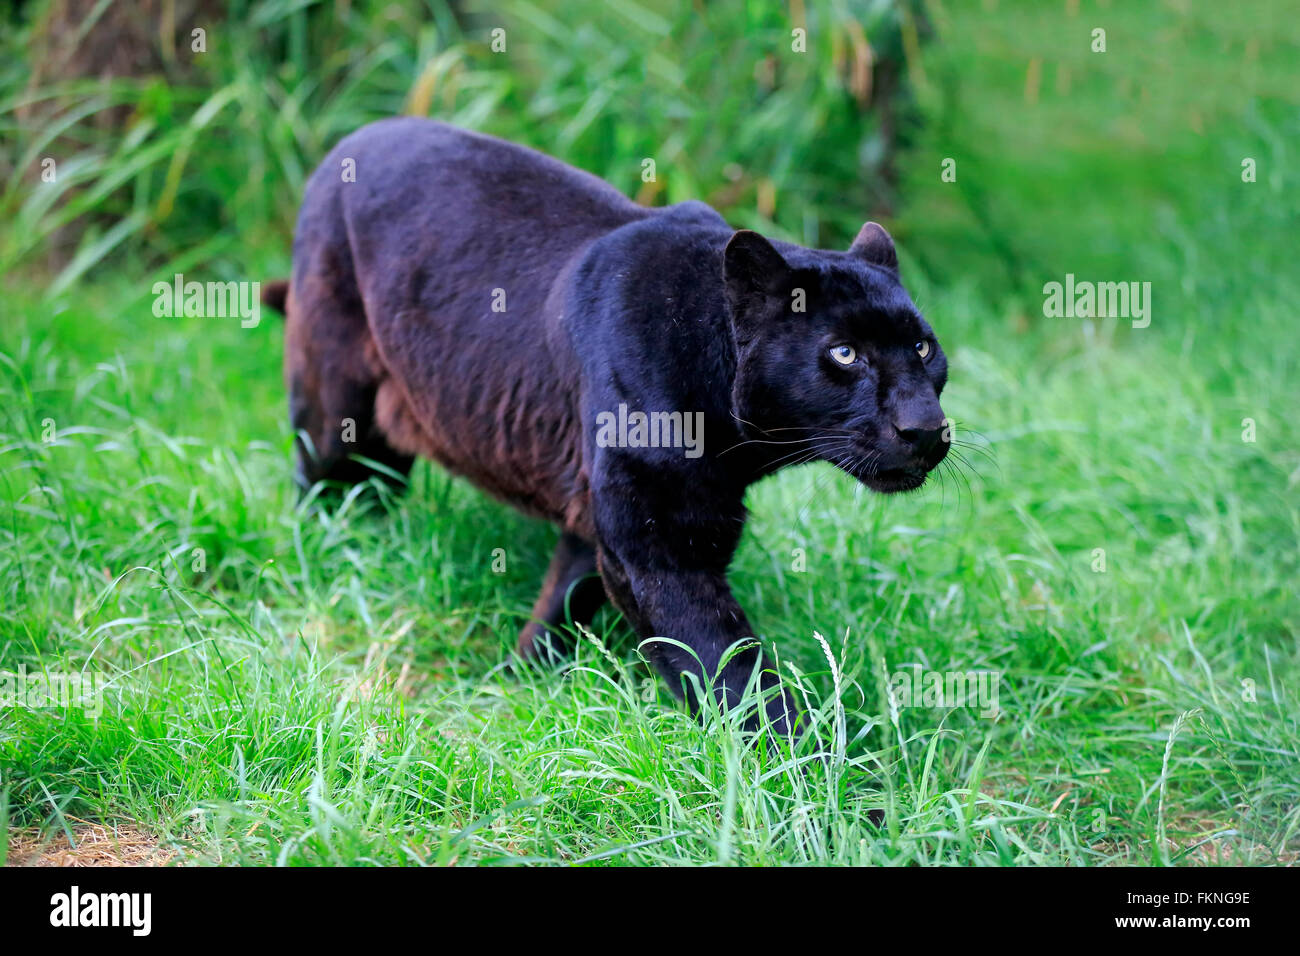 Leopard, black panther, Africa / (Panthera pardus) - Stock Image